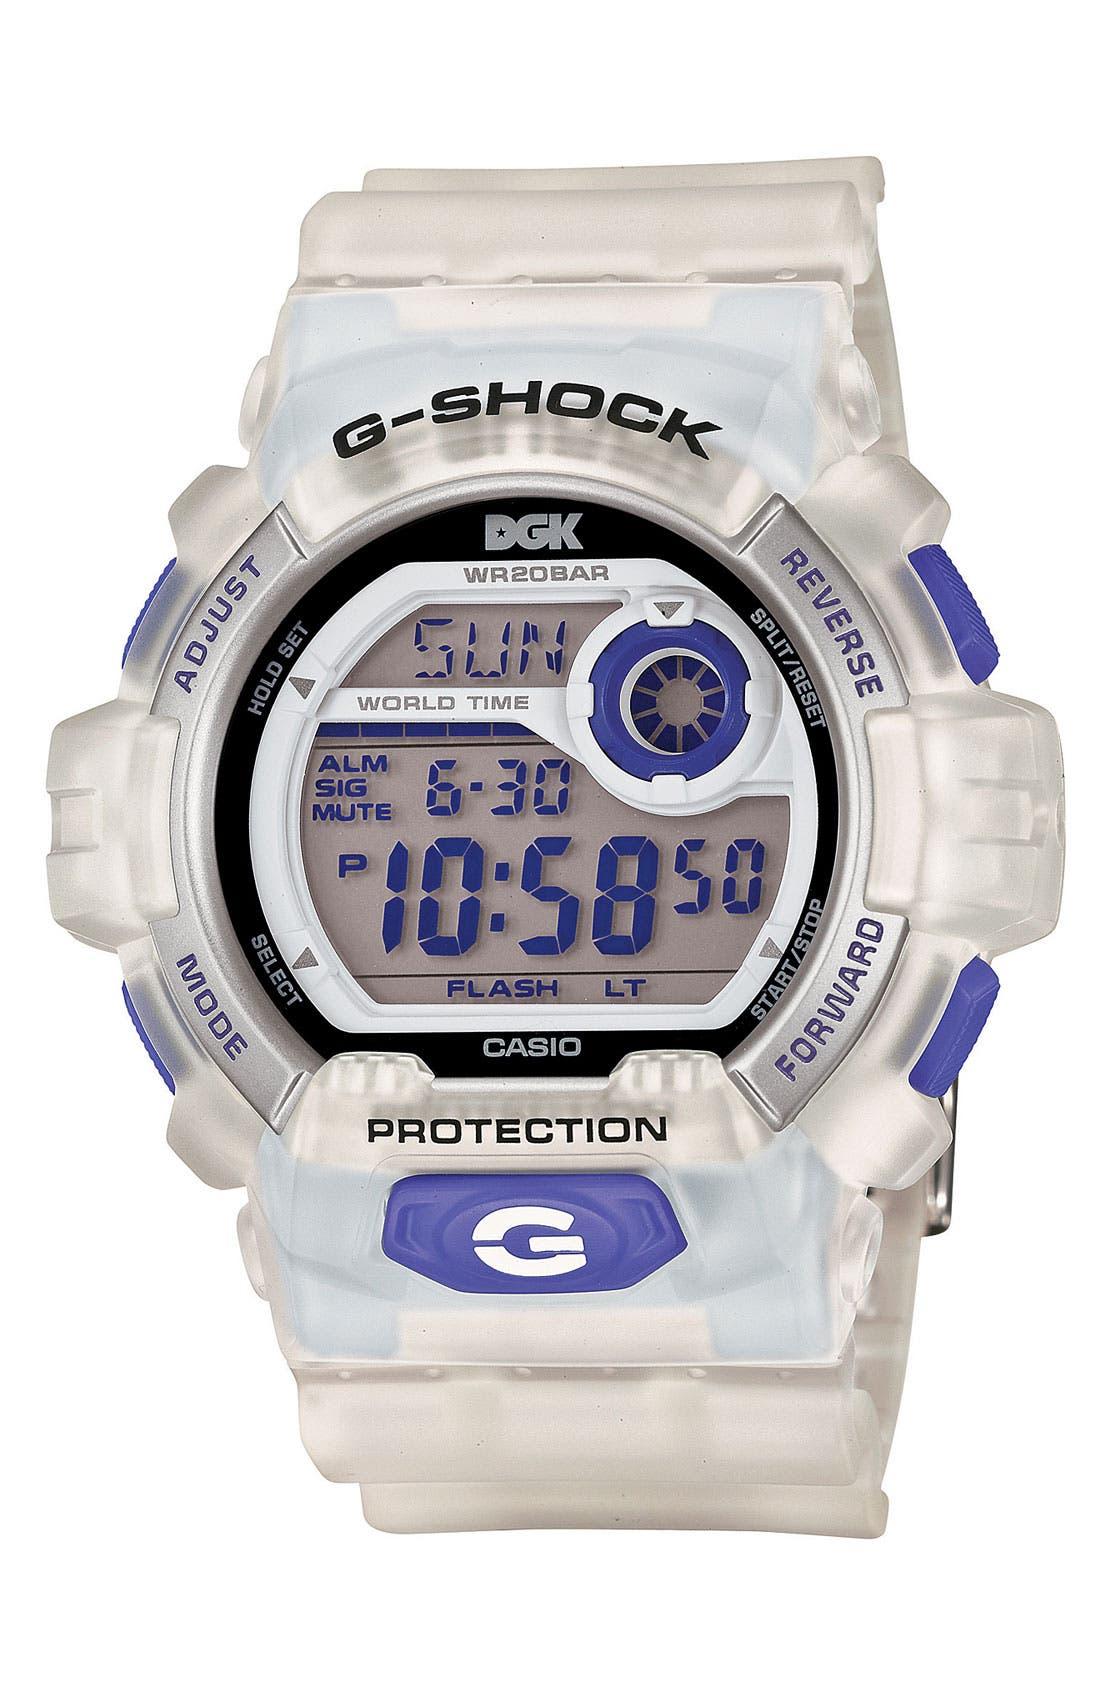 Alternate Image 1 Selected - G-Shock 'DGK' Digital Watch, 55mm